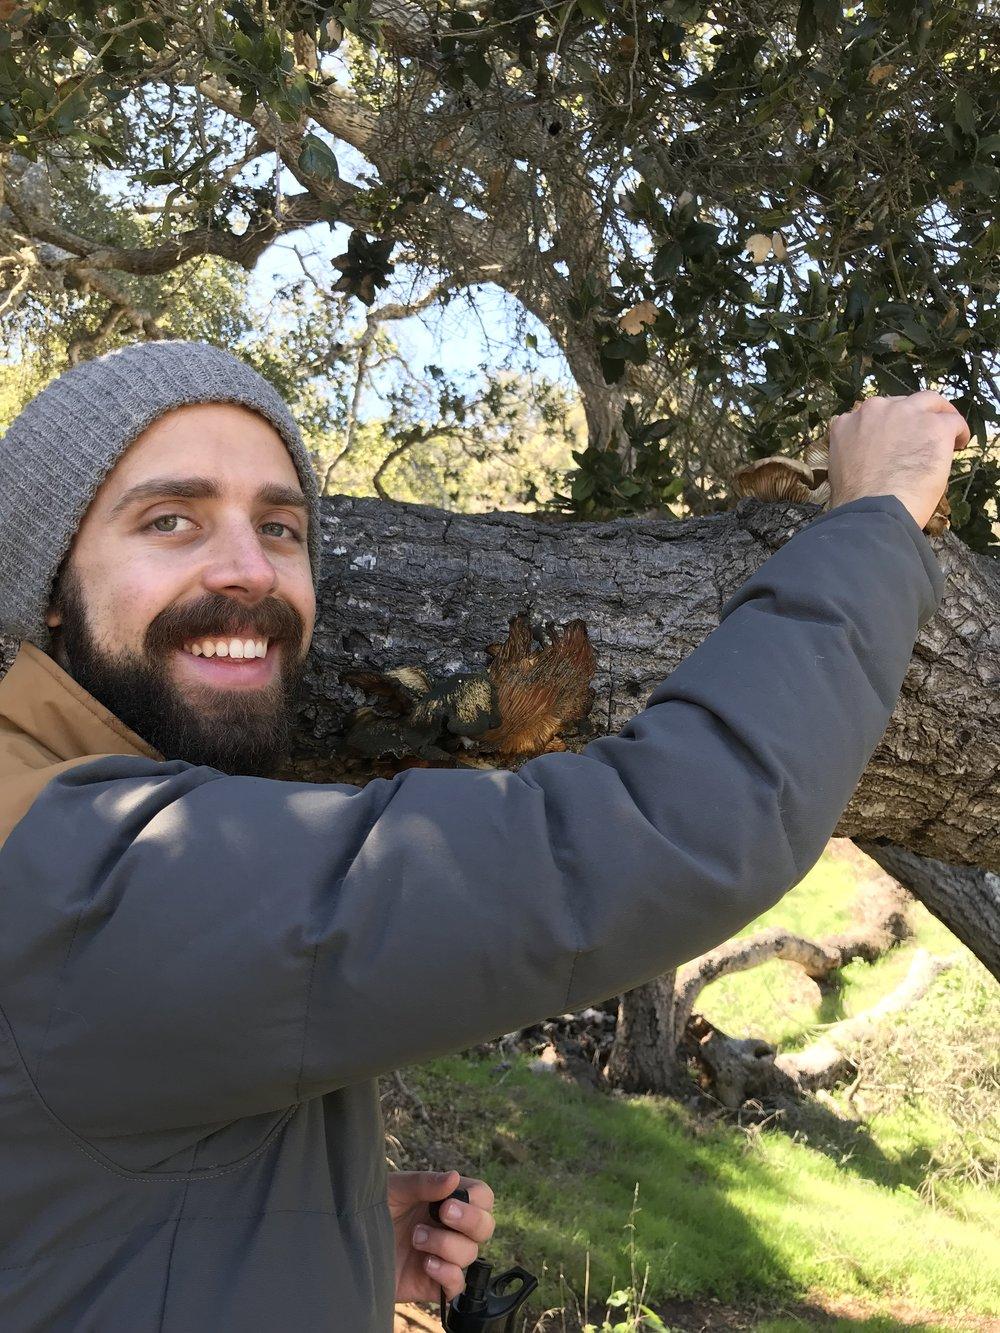 Bennett geeking out over false chantrelle mushrooms on the Pelican Trail